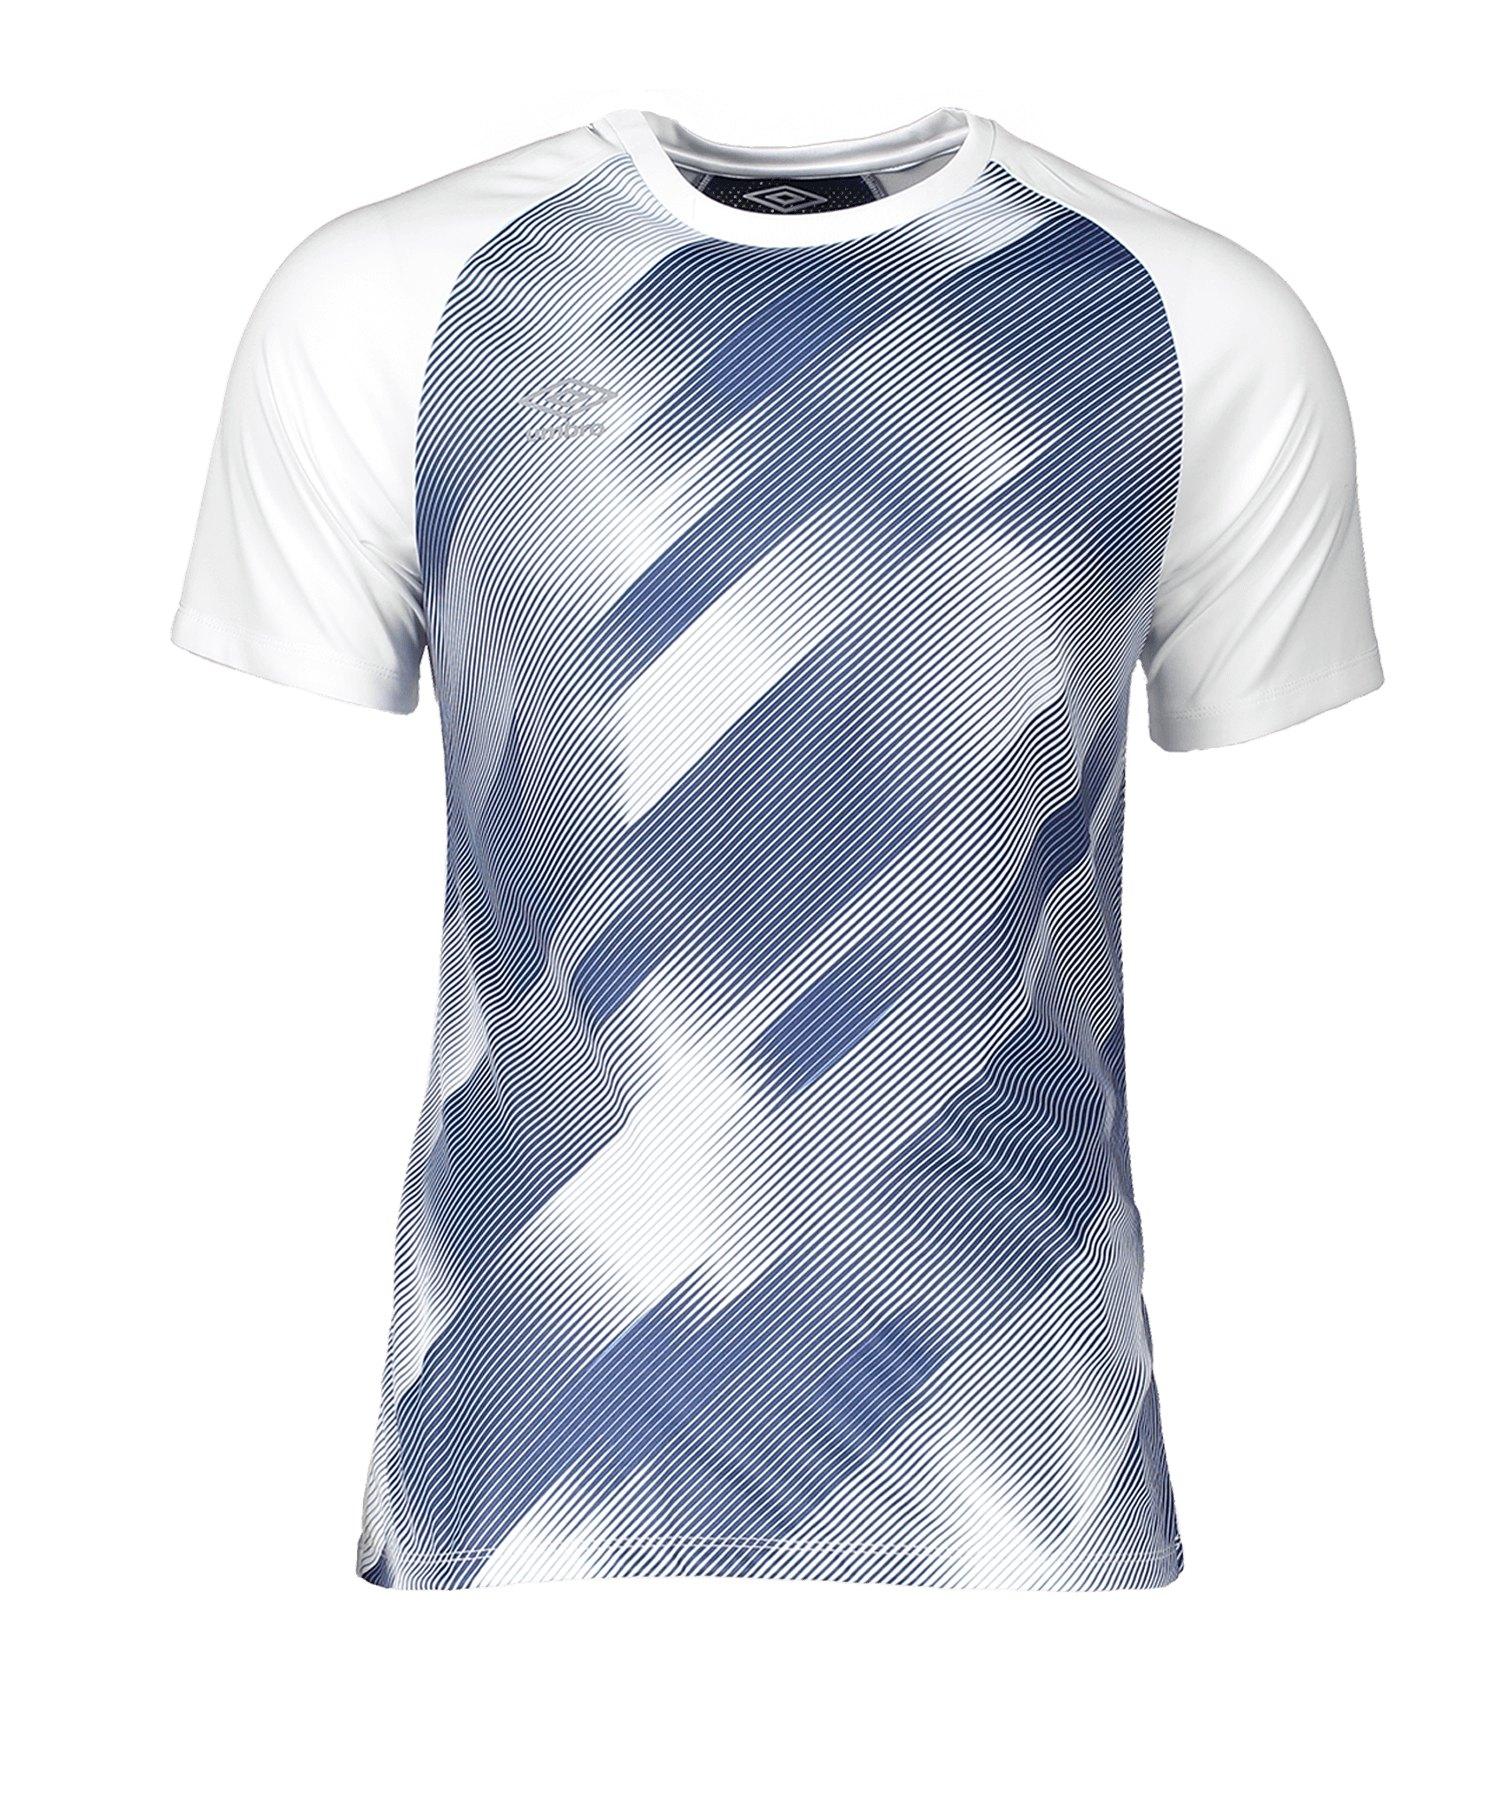 Umbro Training Graphic Tee T-Shirt Weiss 13V - weiss